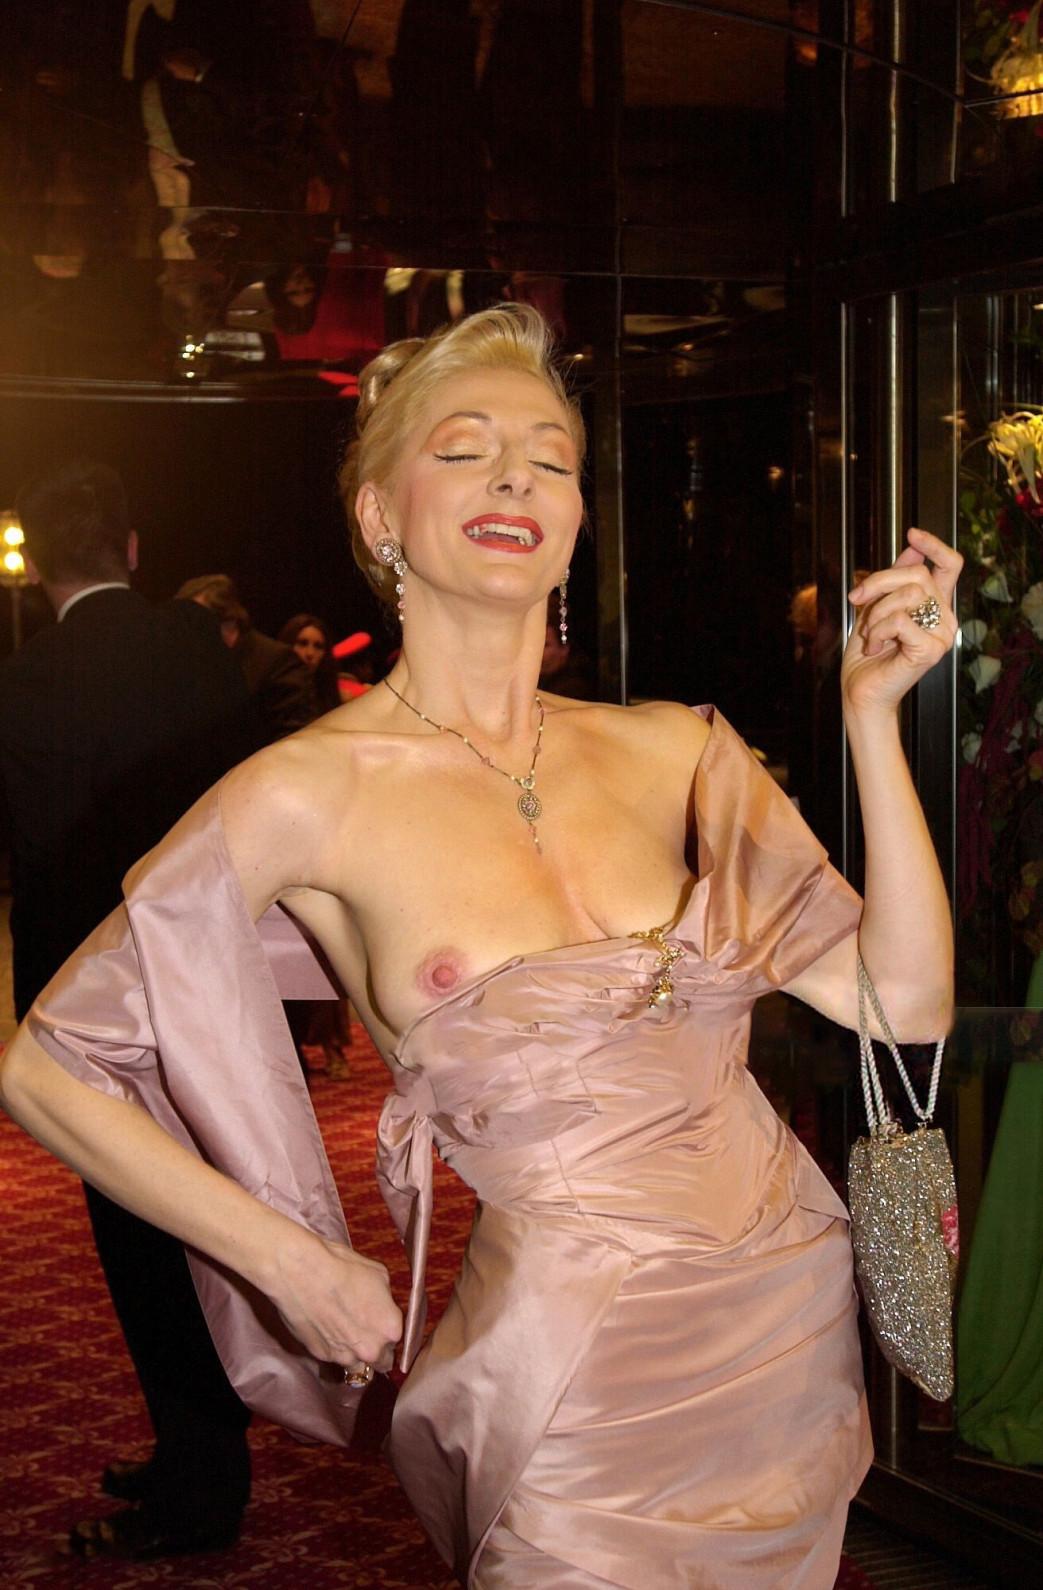 Desiree-Nick-Boob-Slip-at-unesco-benefiz-gala-2001-1.jpg